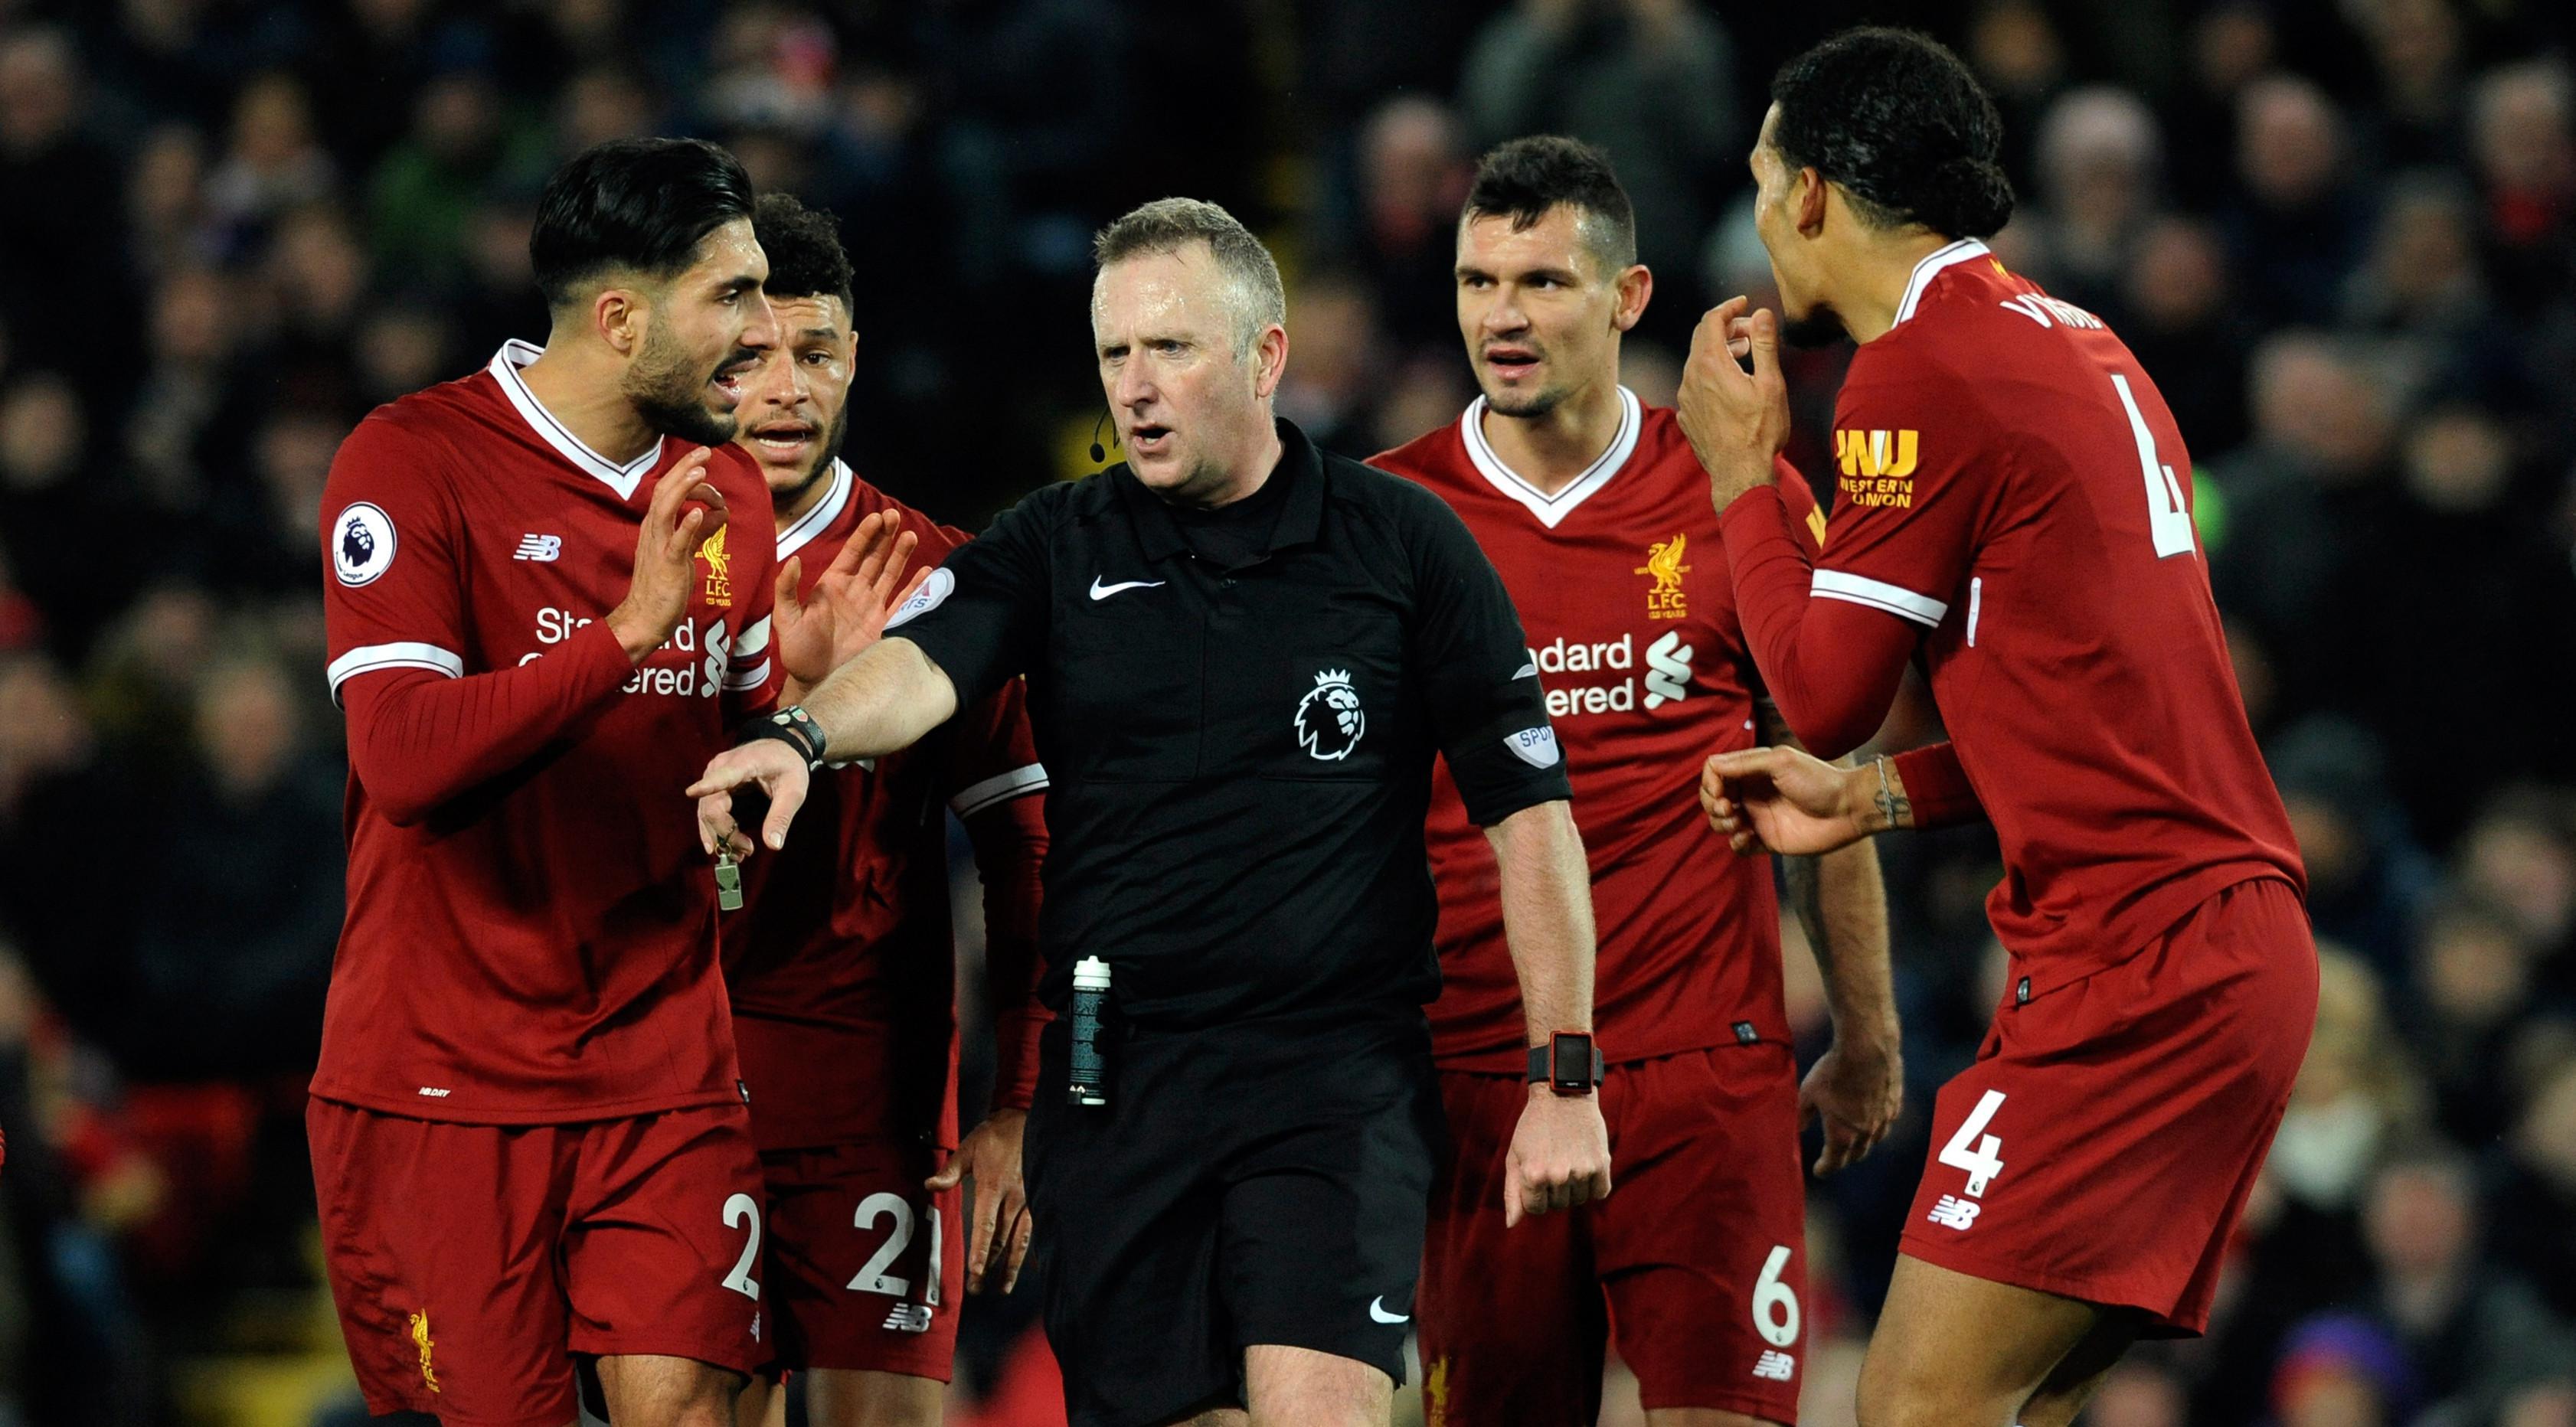 Pemain Liverpool melakukan protes saat dapat hukuman kedua dari wasit Johnathan Moss saat melawan Tottenham Hotspur dalam pertandingan Liga Inggris di Anfield, Liverpool (4/2). (AP Photo/Rui Vieira)